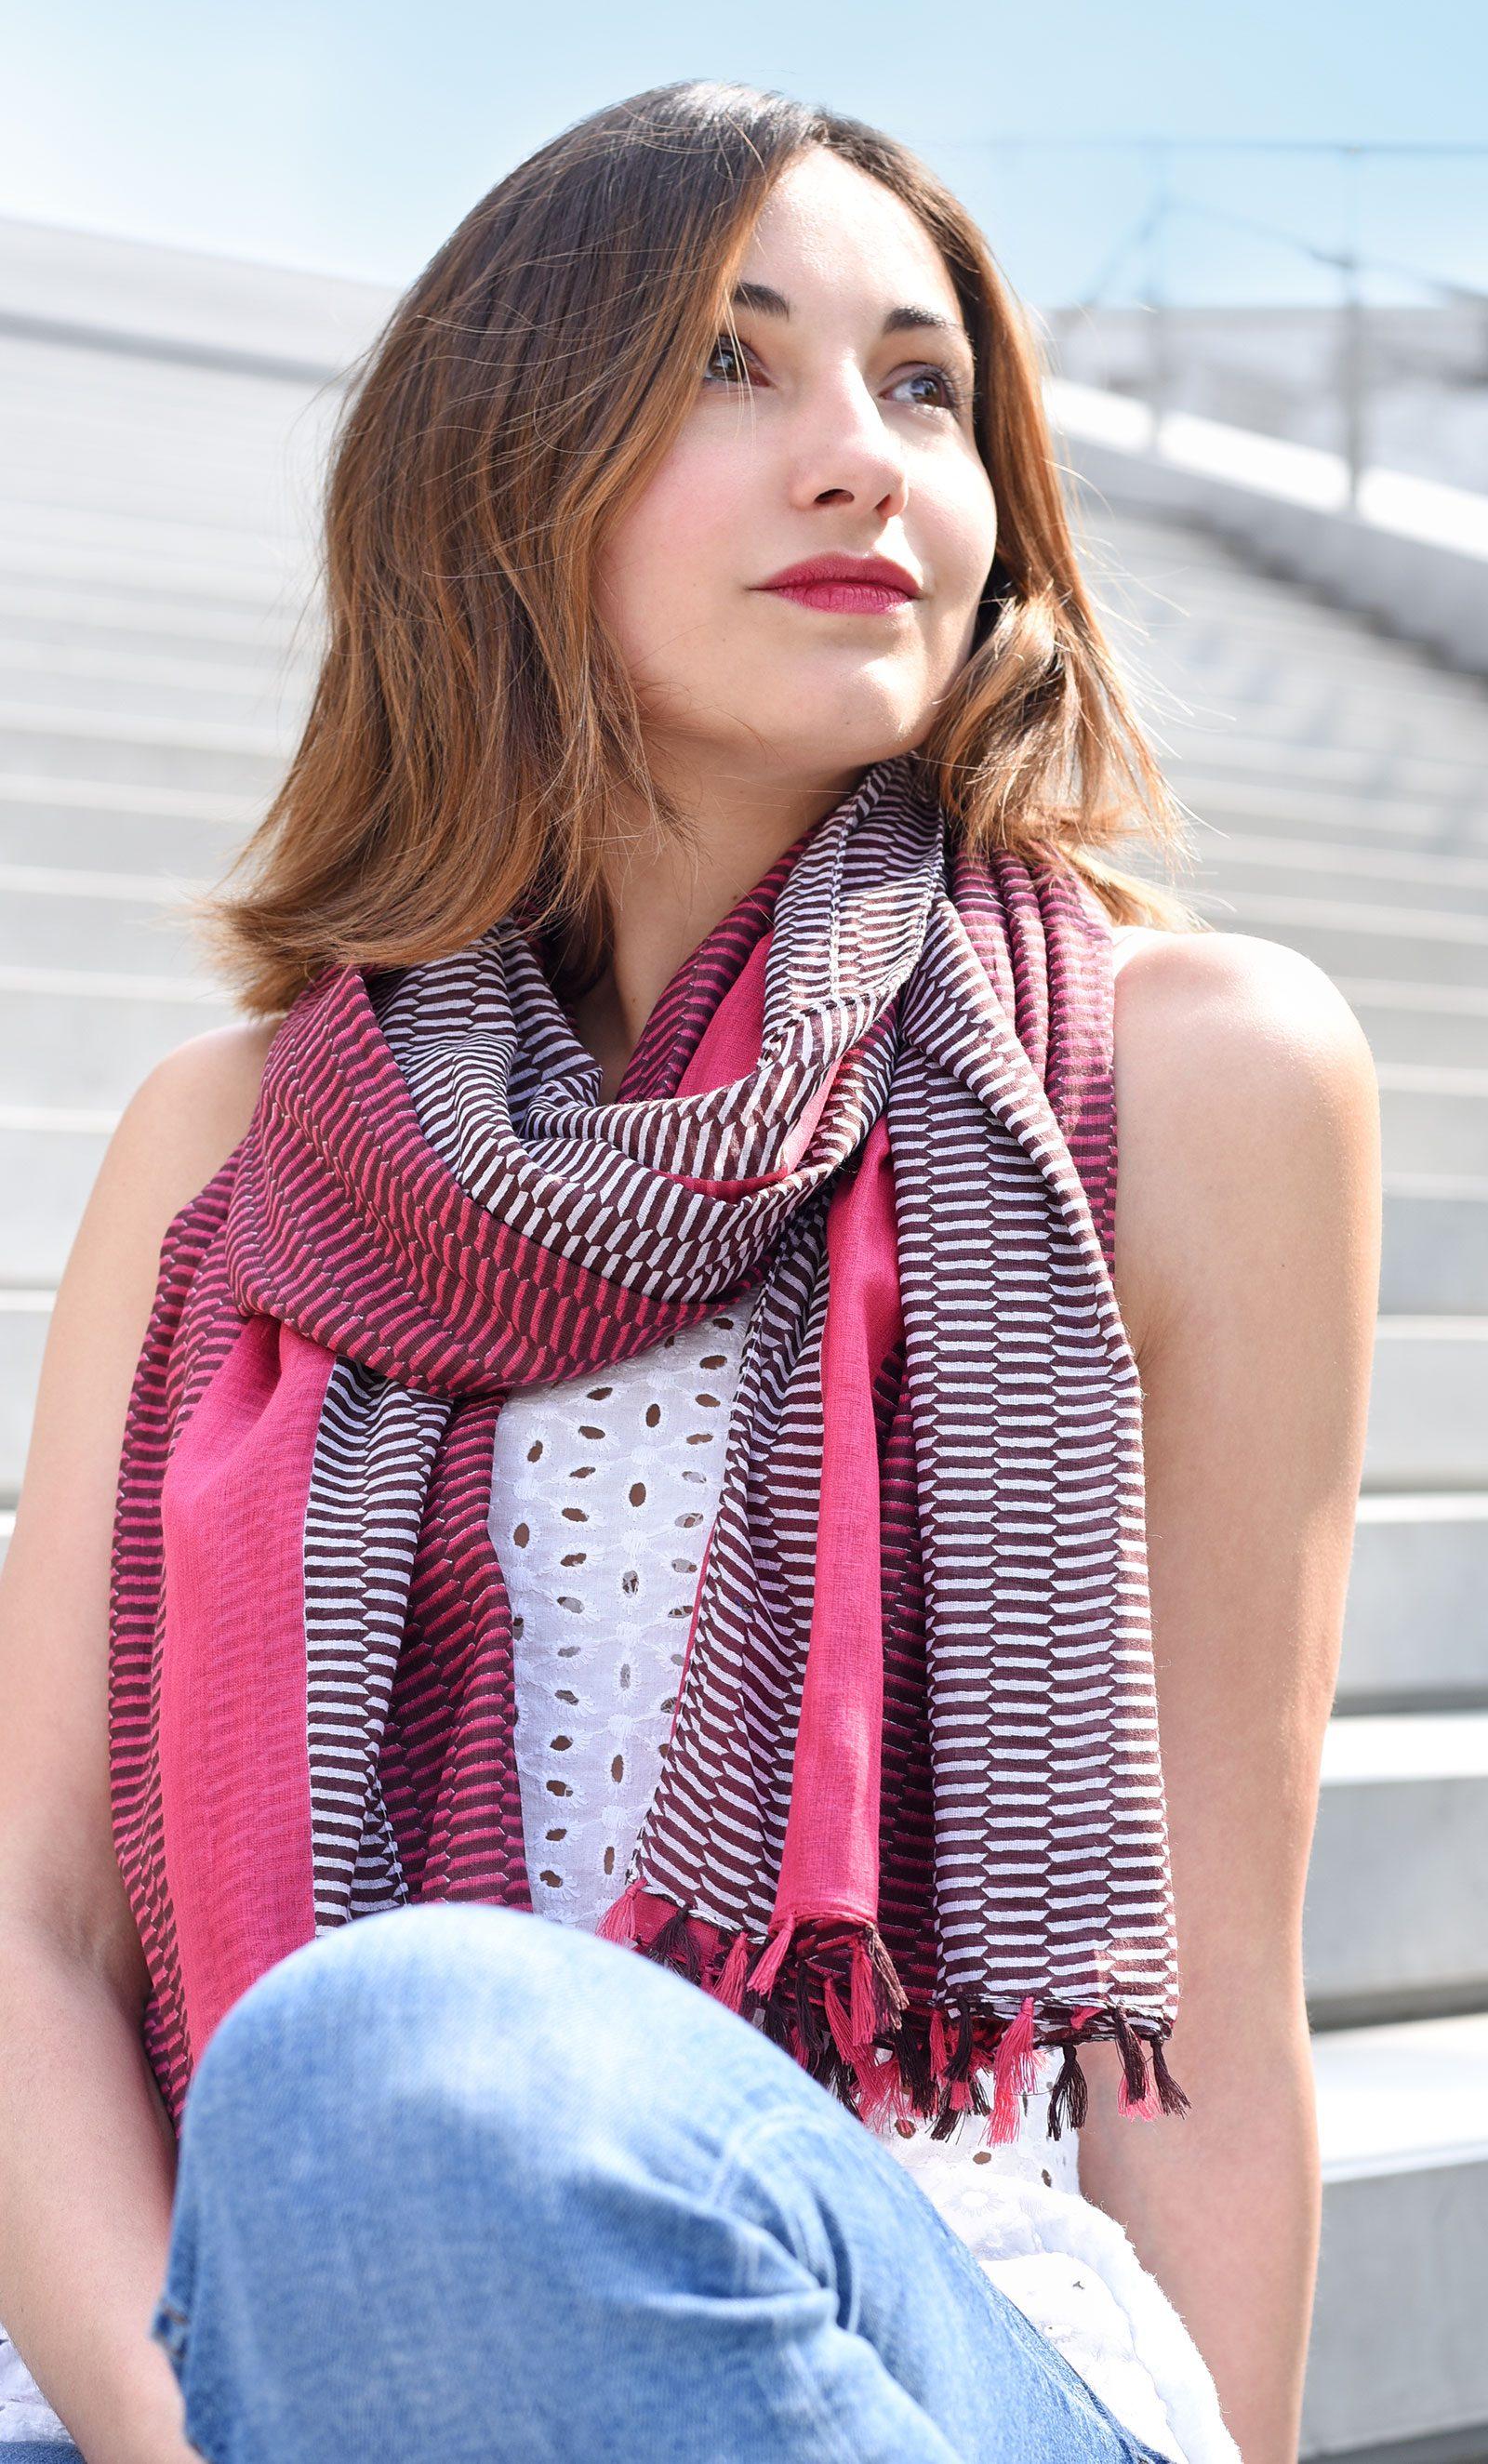 http://lookbook.allee-du-foulard.fr/wp-content/uploads/2018/06/0679-ADF-Accessoires-de-mode-LB-Coll_geometrique-escala-fuchsia-1-1600x2650.jpg